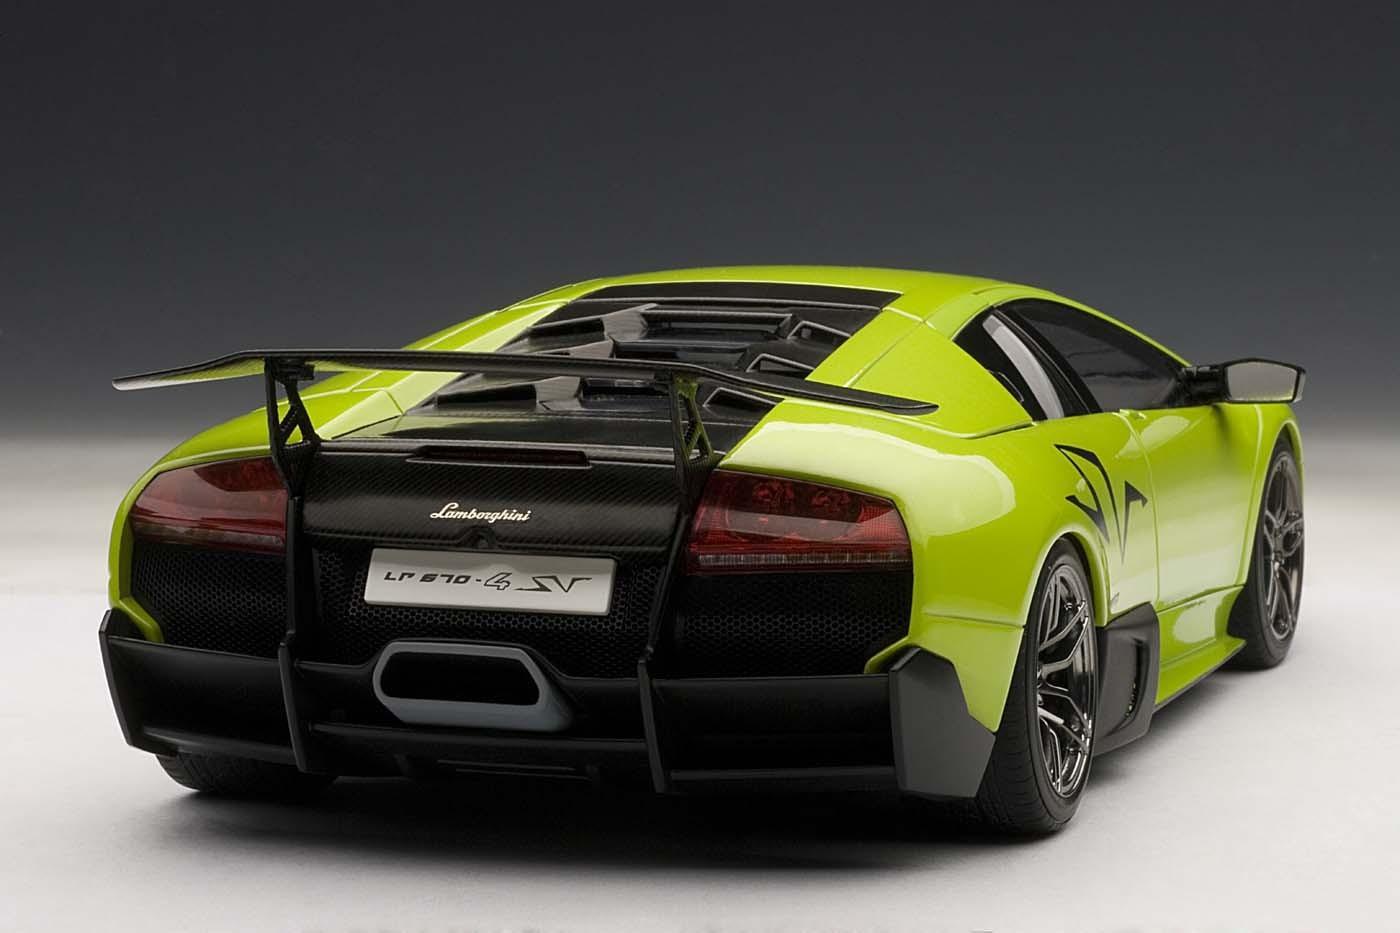 Green Ithaca Lamborghini Murcielago Lp670 4 Sv Autoart Au74627 Scale